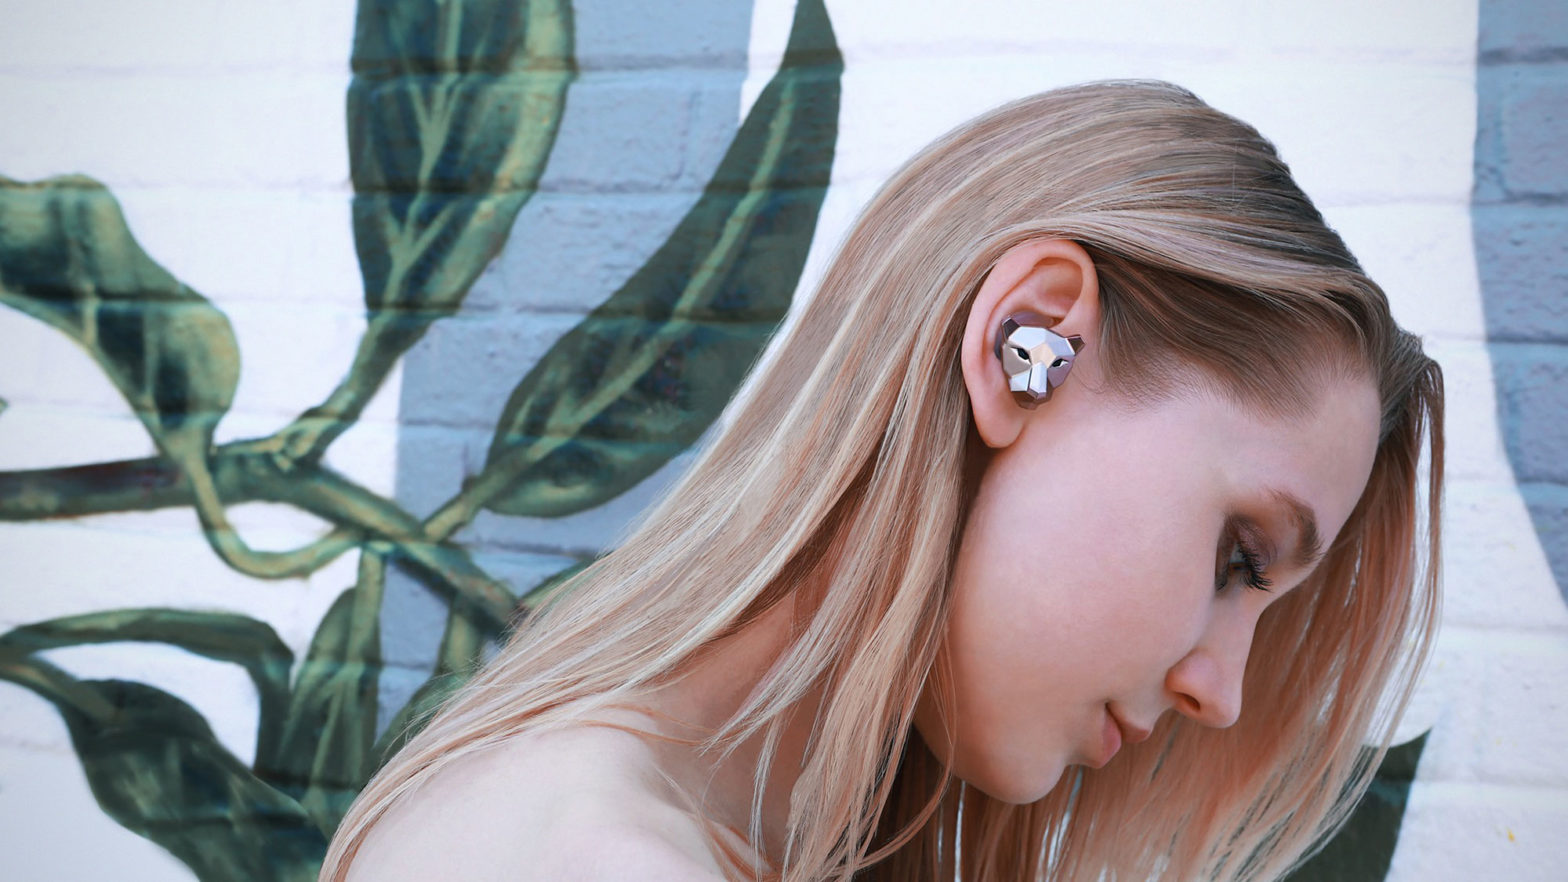 Tiger & Rose True Wireless Earbuds